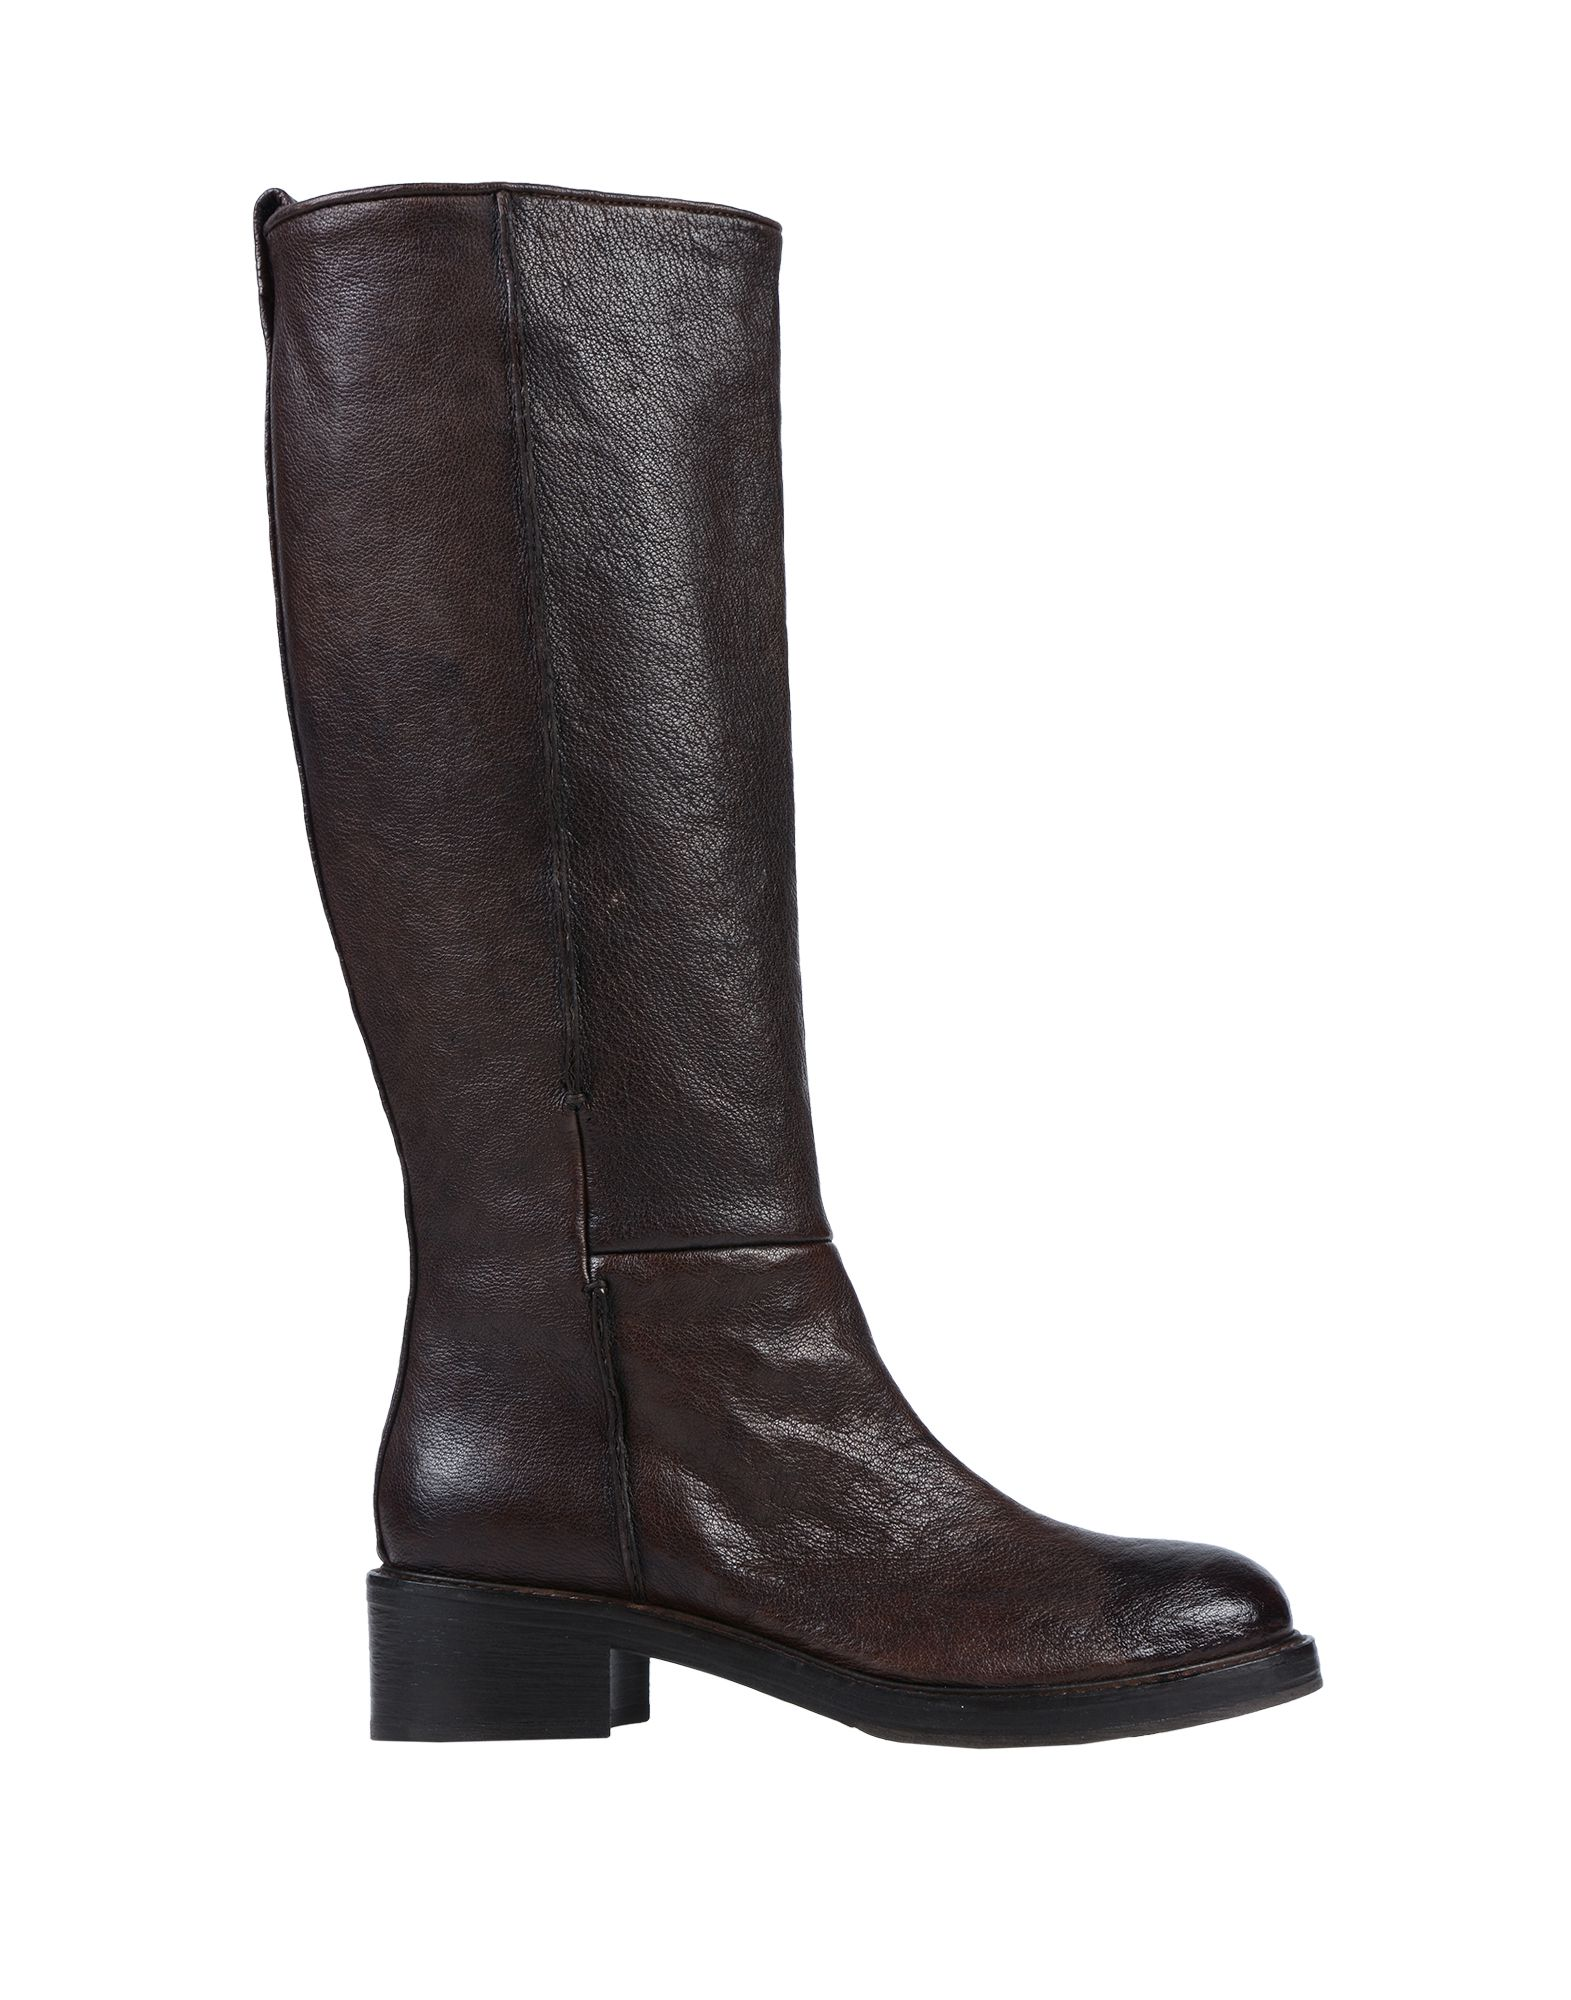 Stilvolle billige Schuhe  Alberto Fermani Stiefel Damen  Schuhe 11560509XM 937127